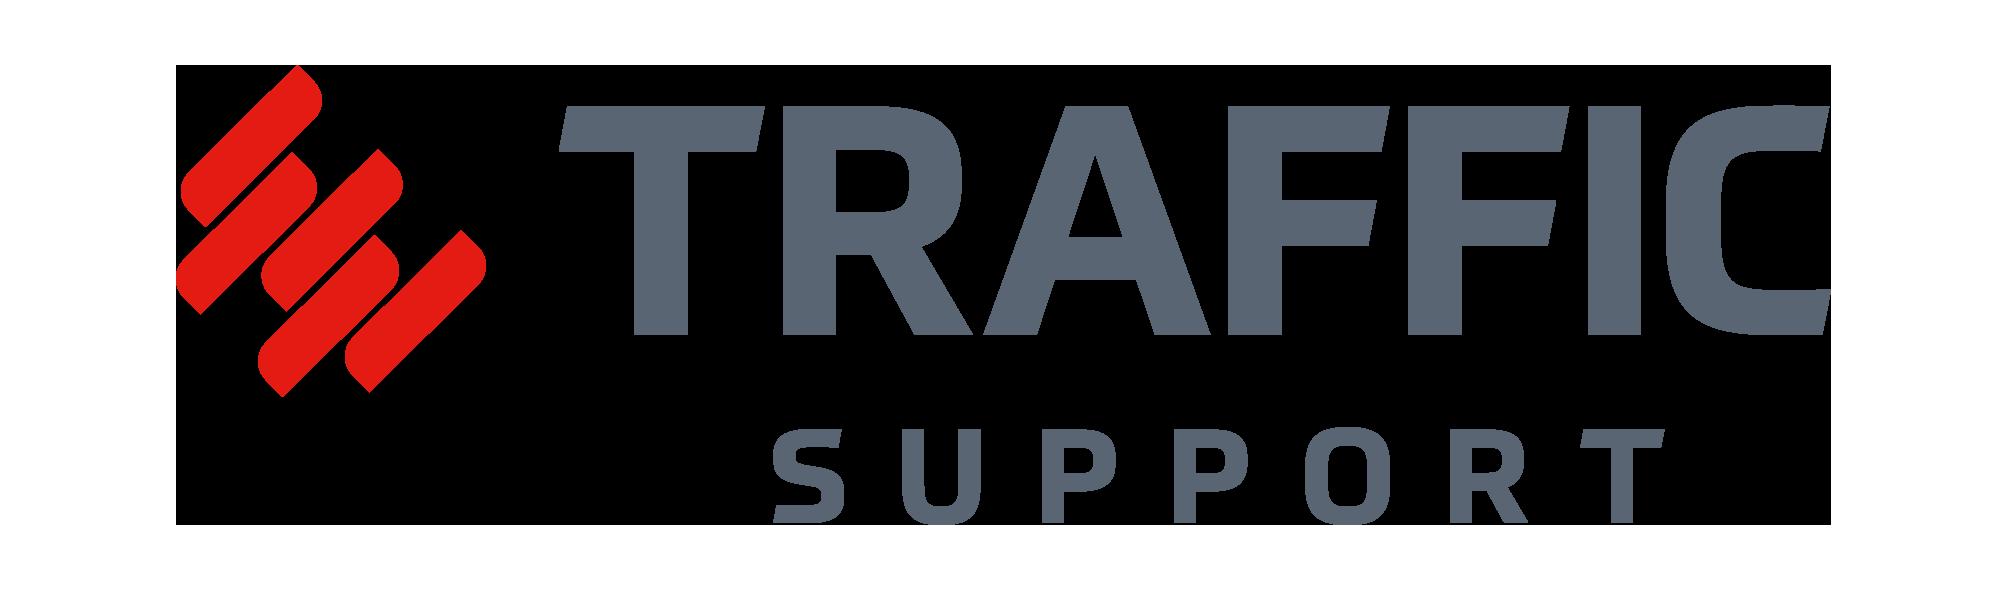 Traffic Support